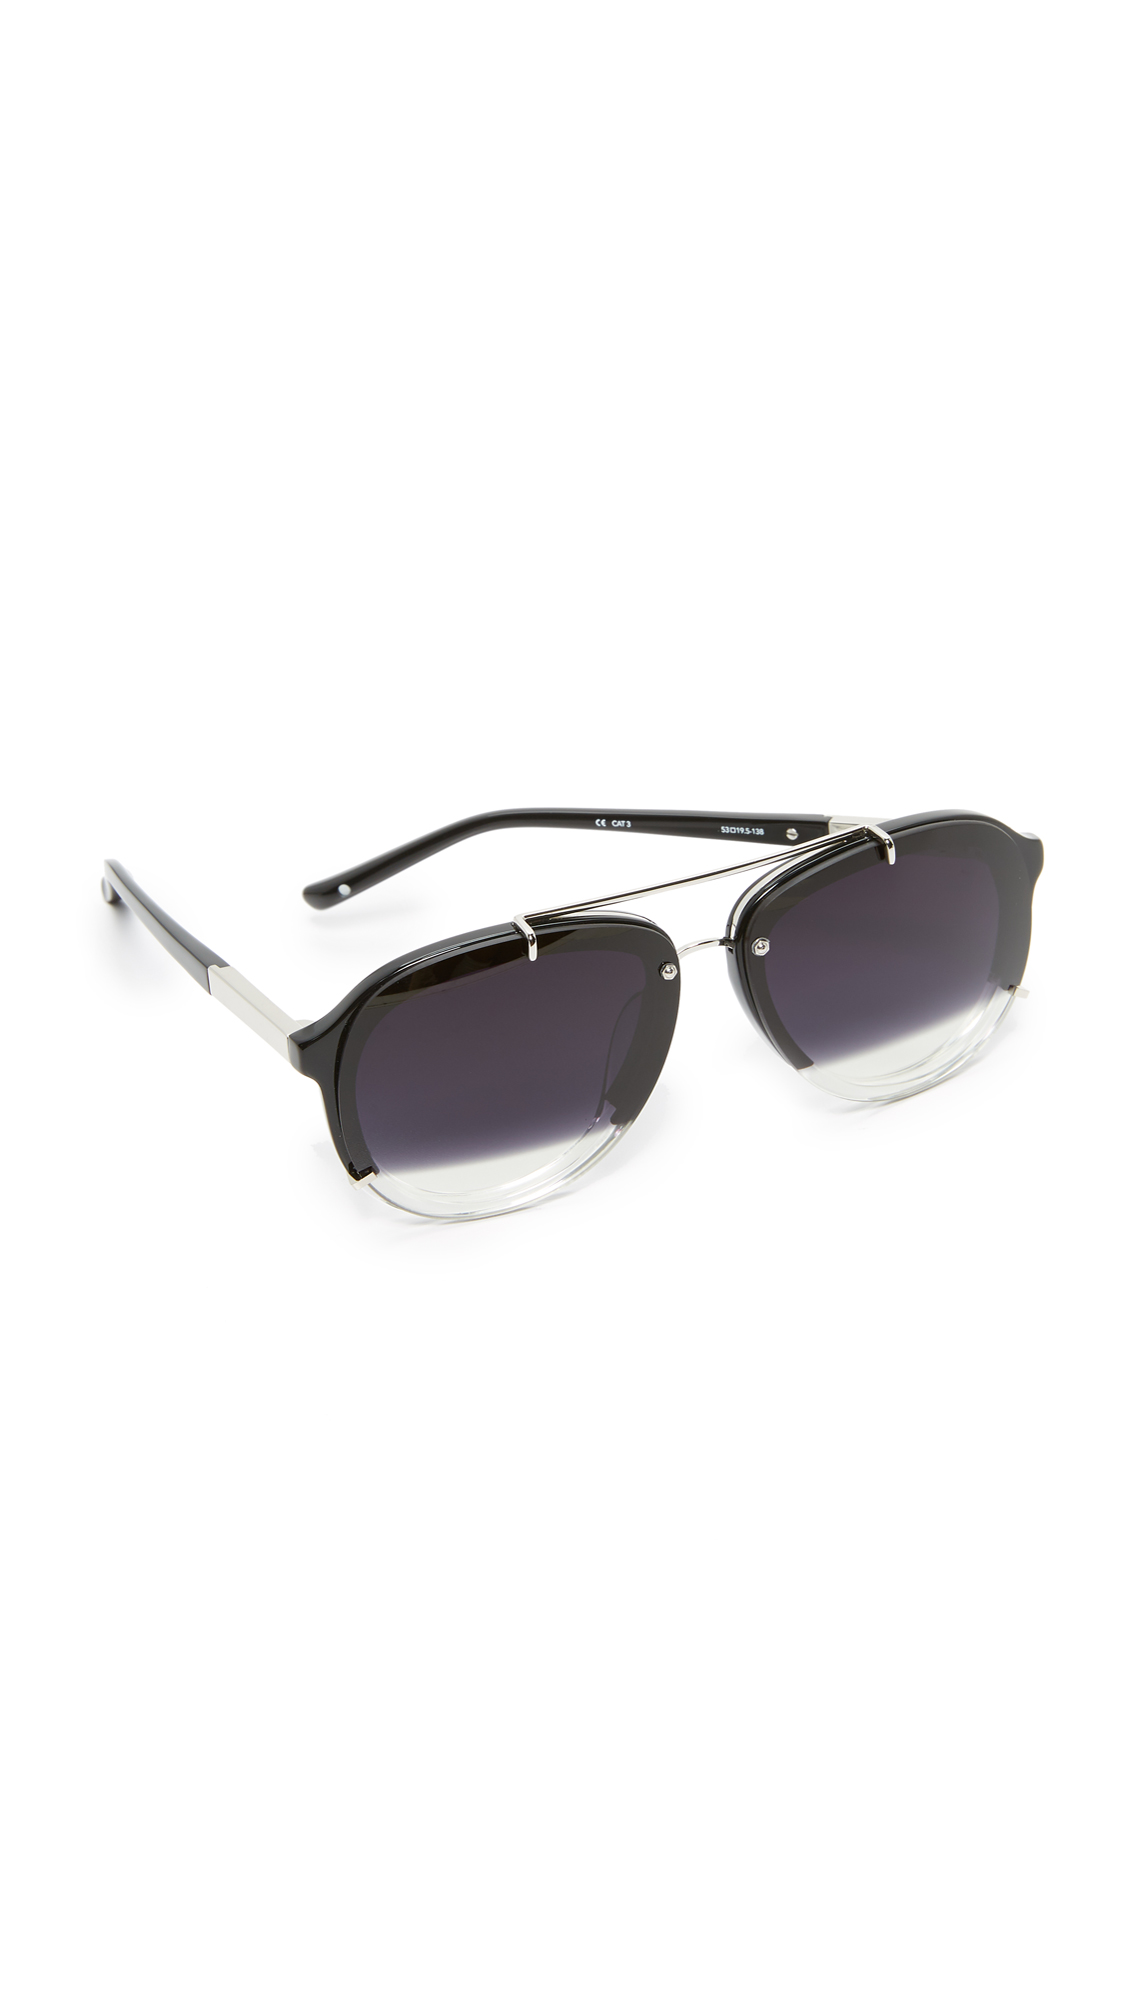 3.1 Phillip Lim Split Aviator Sunglasses - Silver/Black To Clear